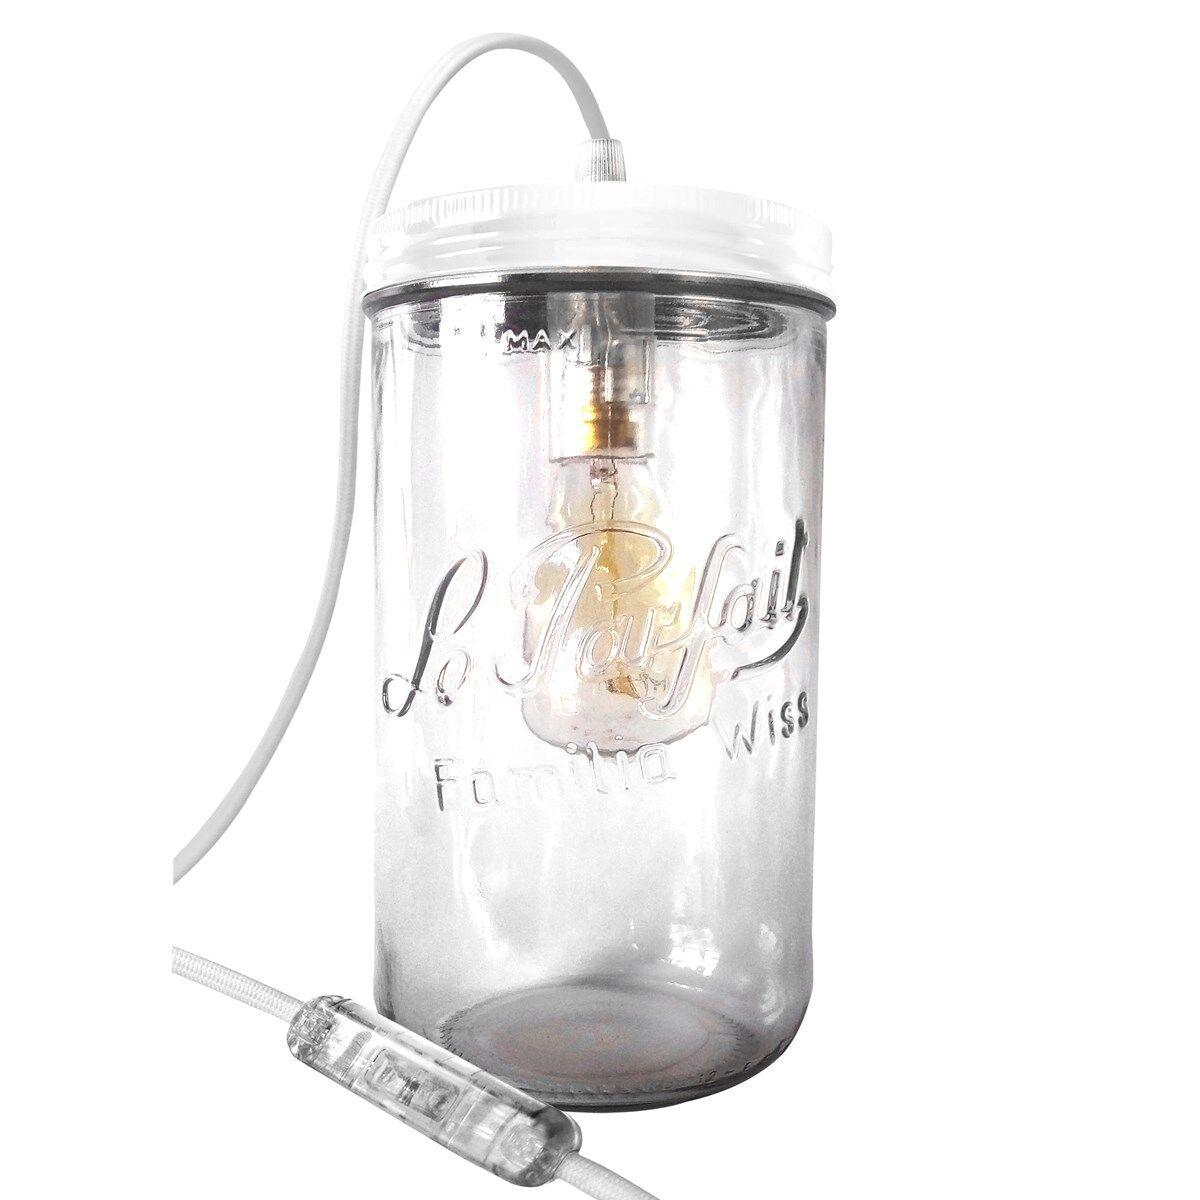 Fenel & Arno Lampe bocal XL en verre blanc